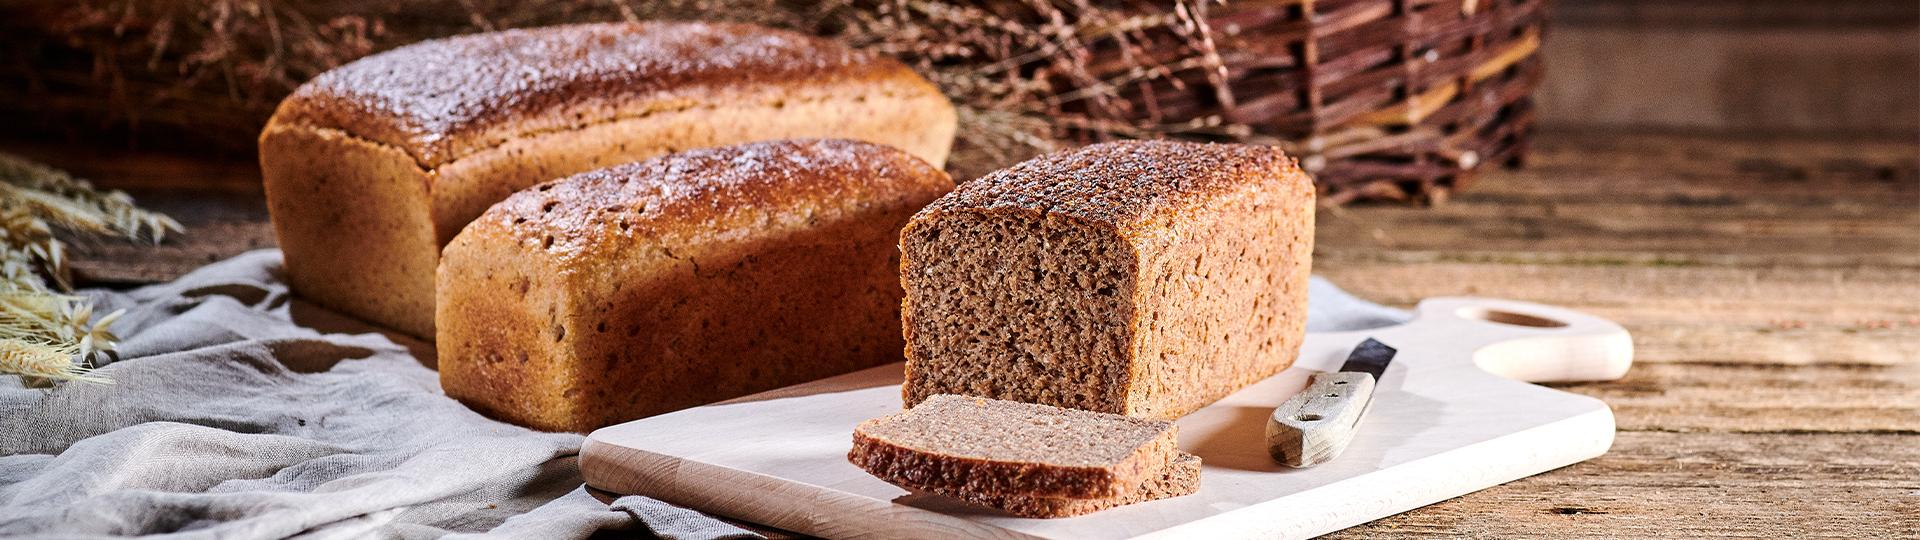 Chleby o niskim IG